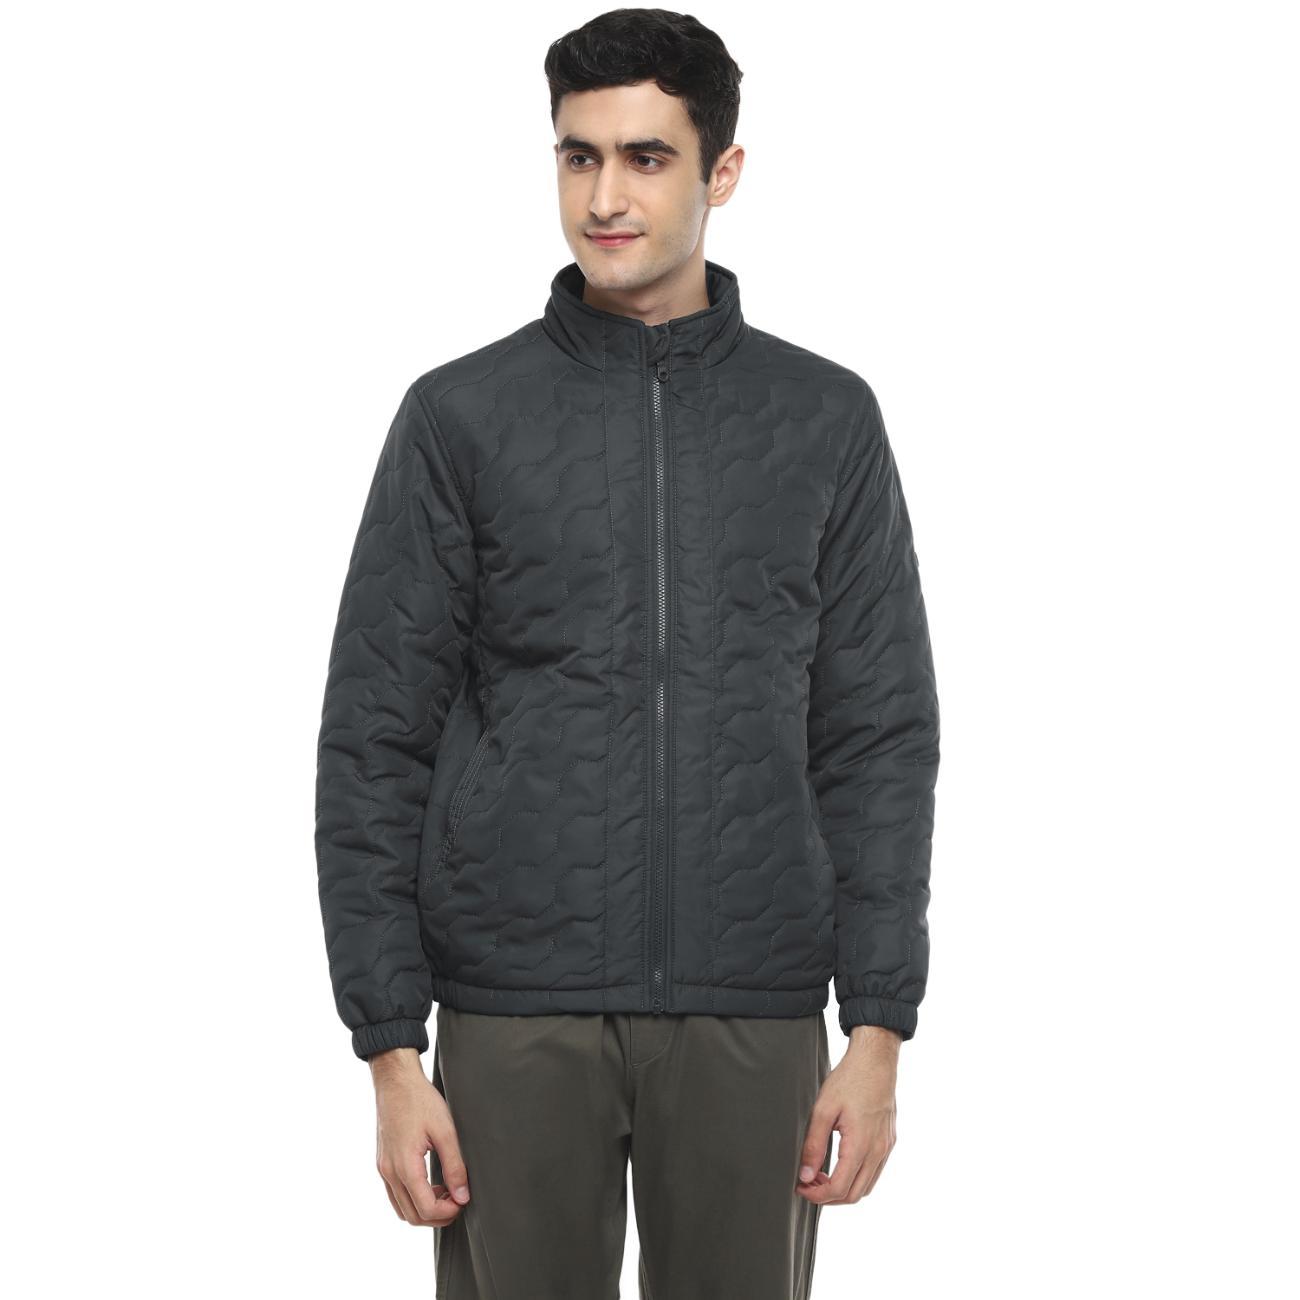 Buy Grey Jacket For Men